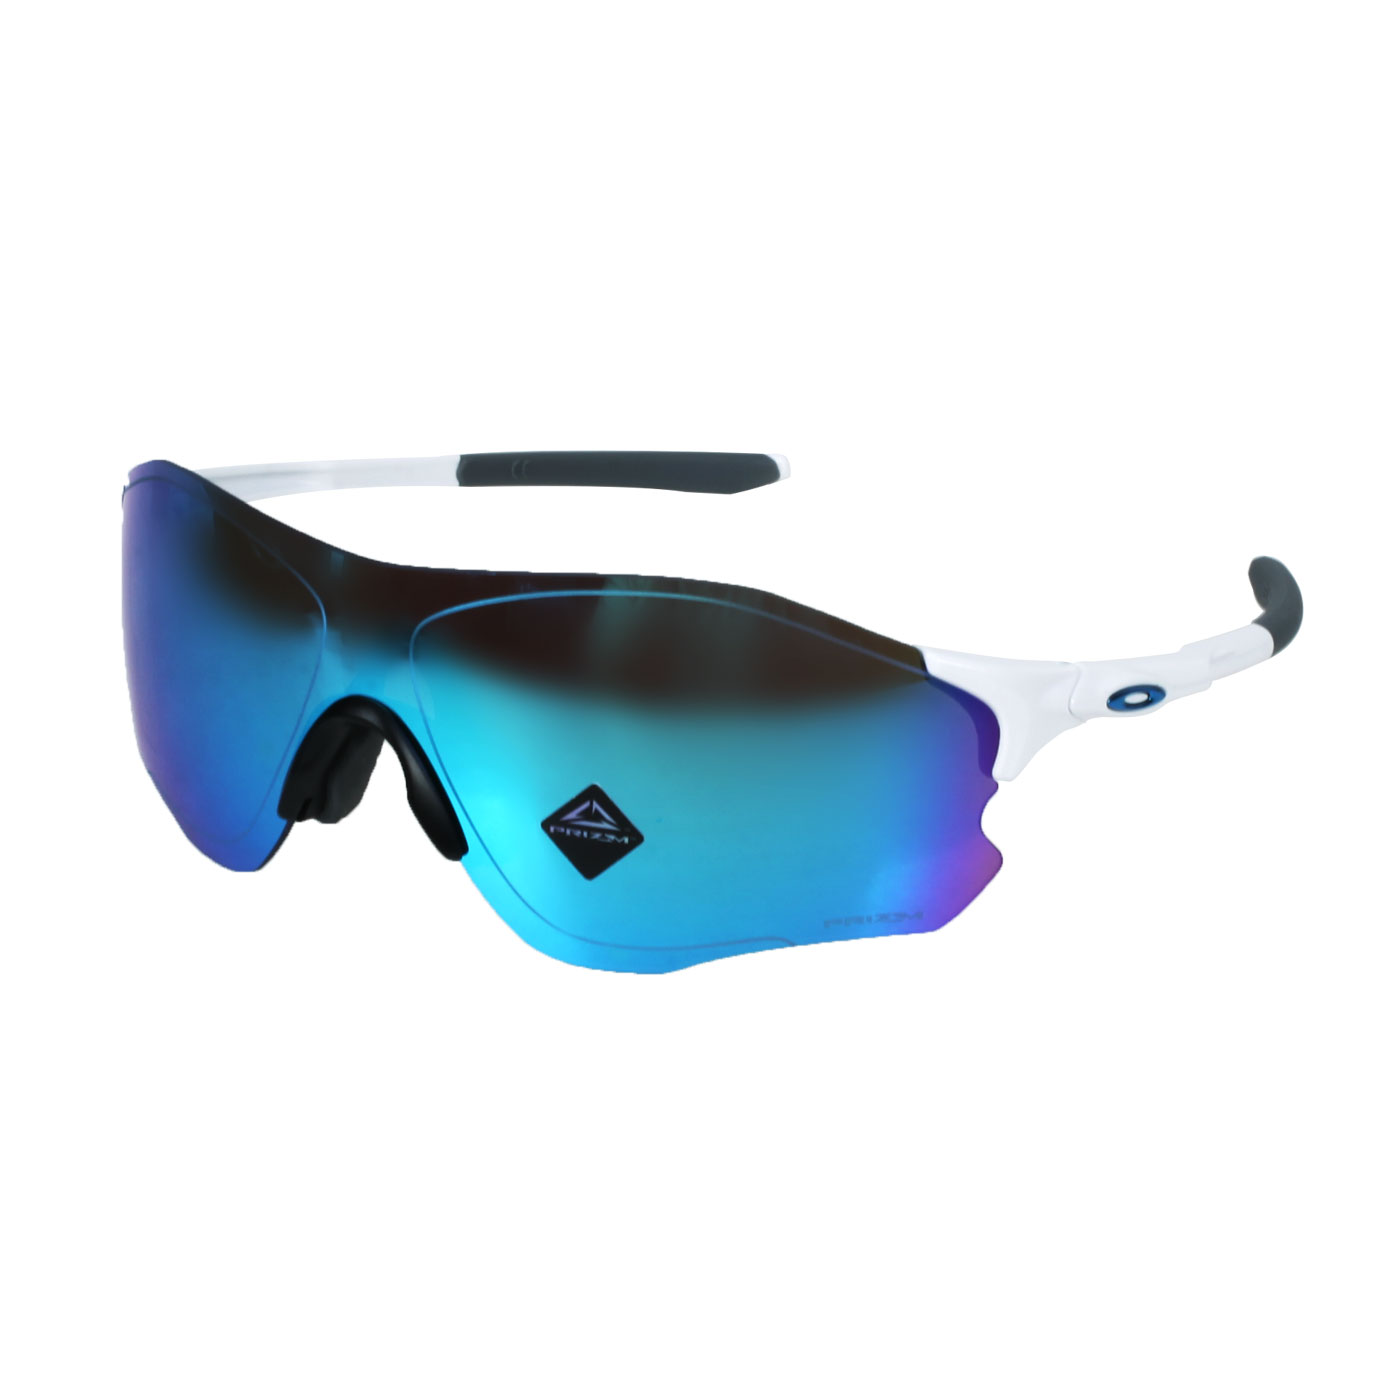 OAKLEY EVZERO PATH一般太陽眼鏡(附硬盒鼻墊) OAK-OO9313-1538 - 白藍